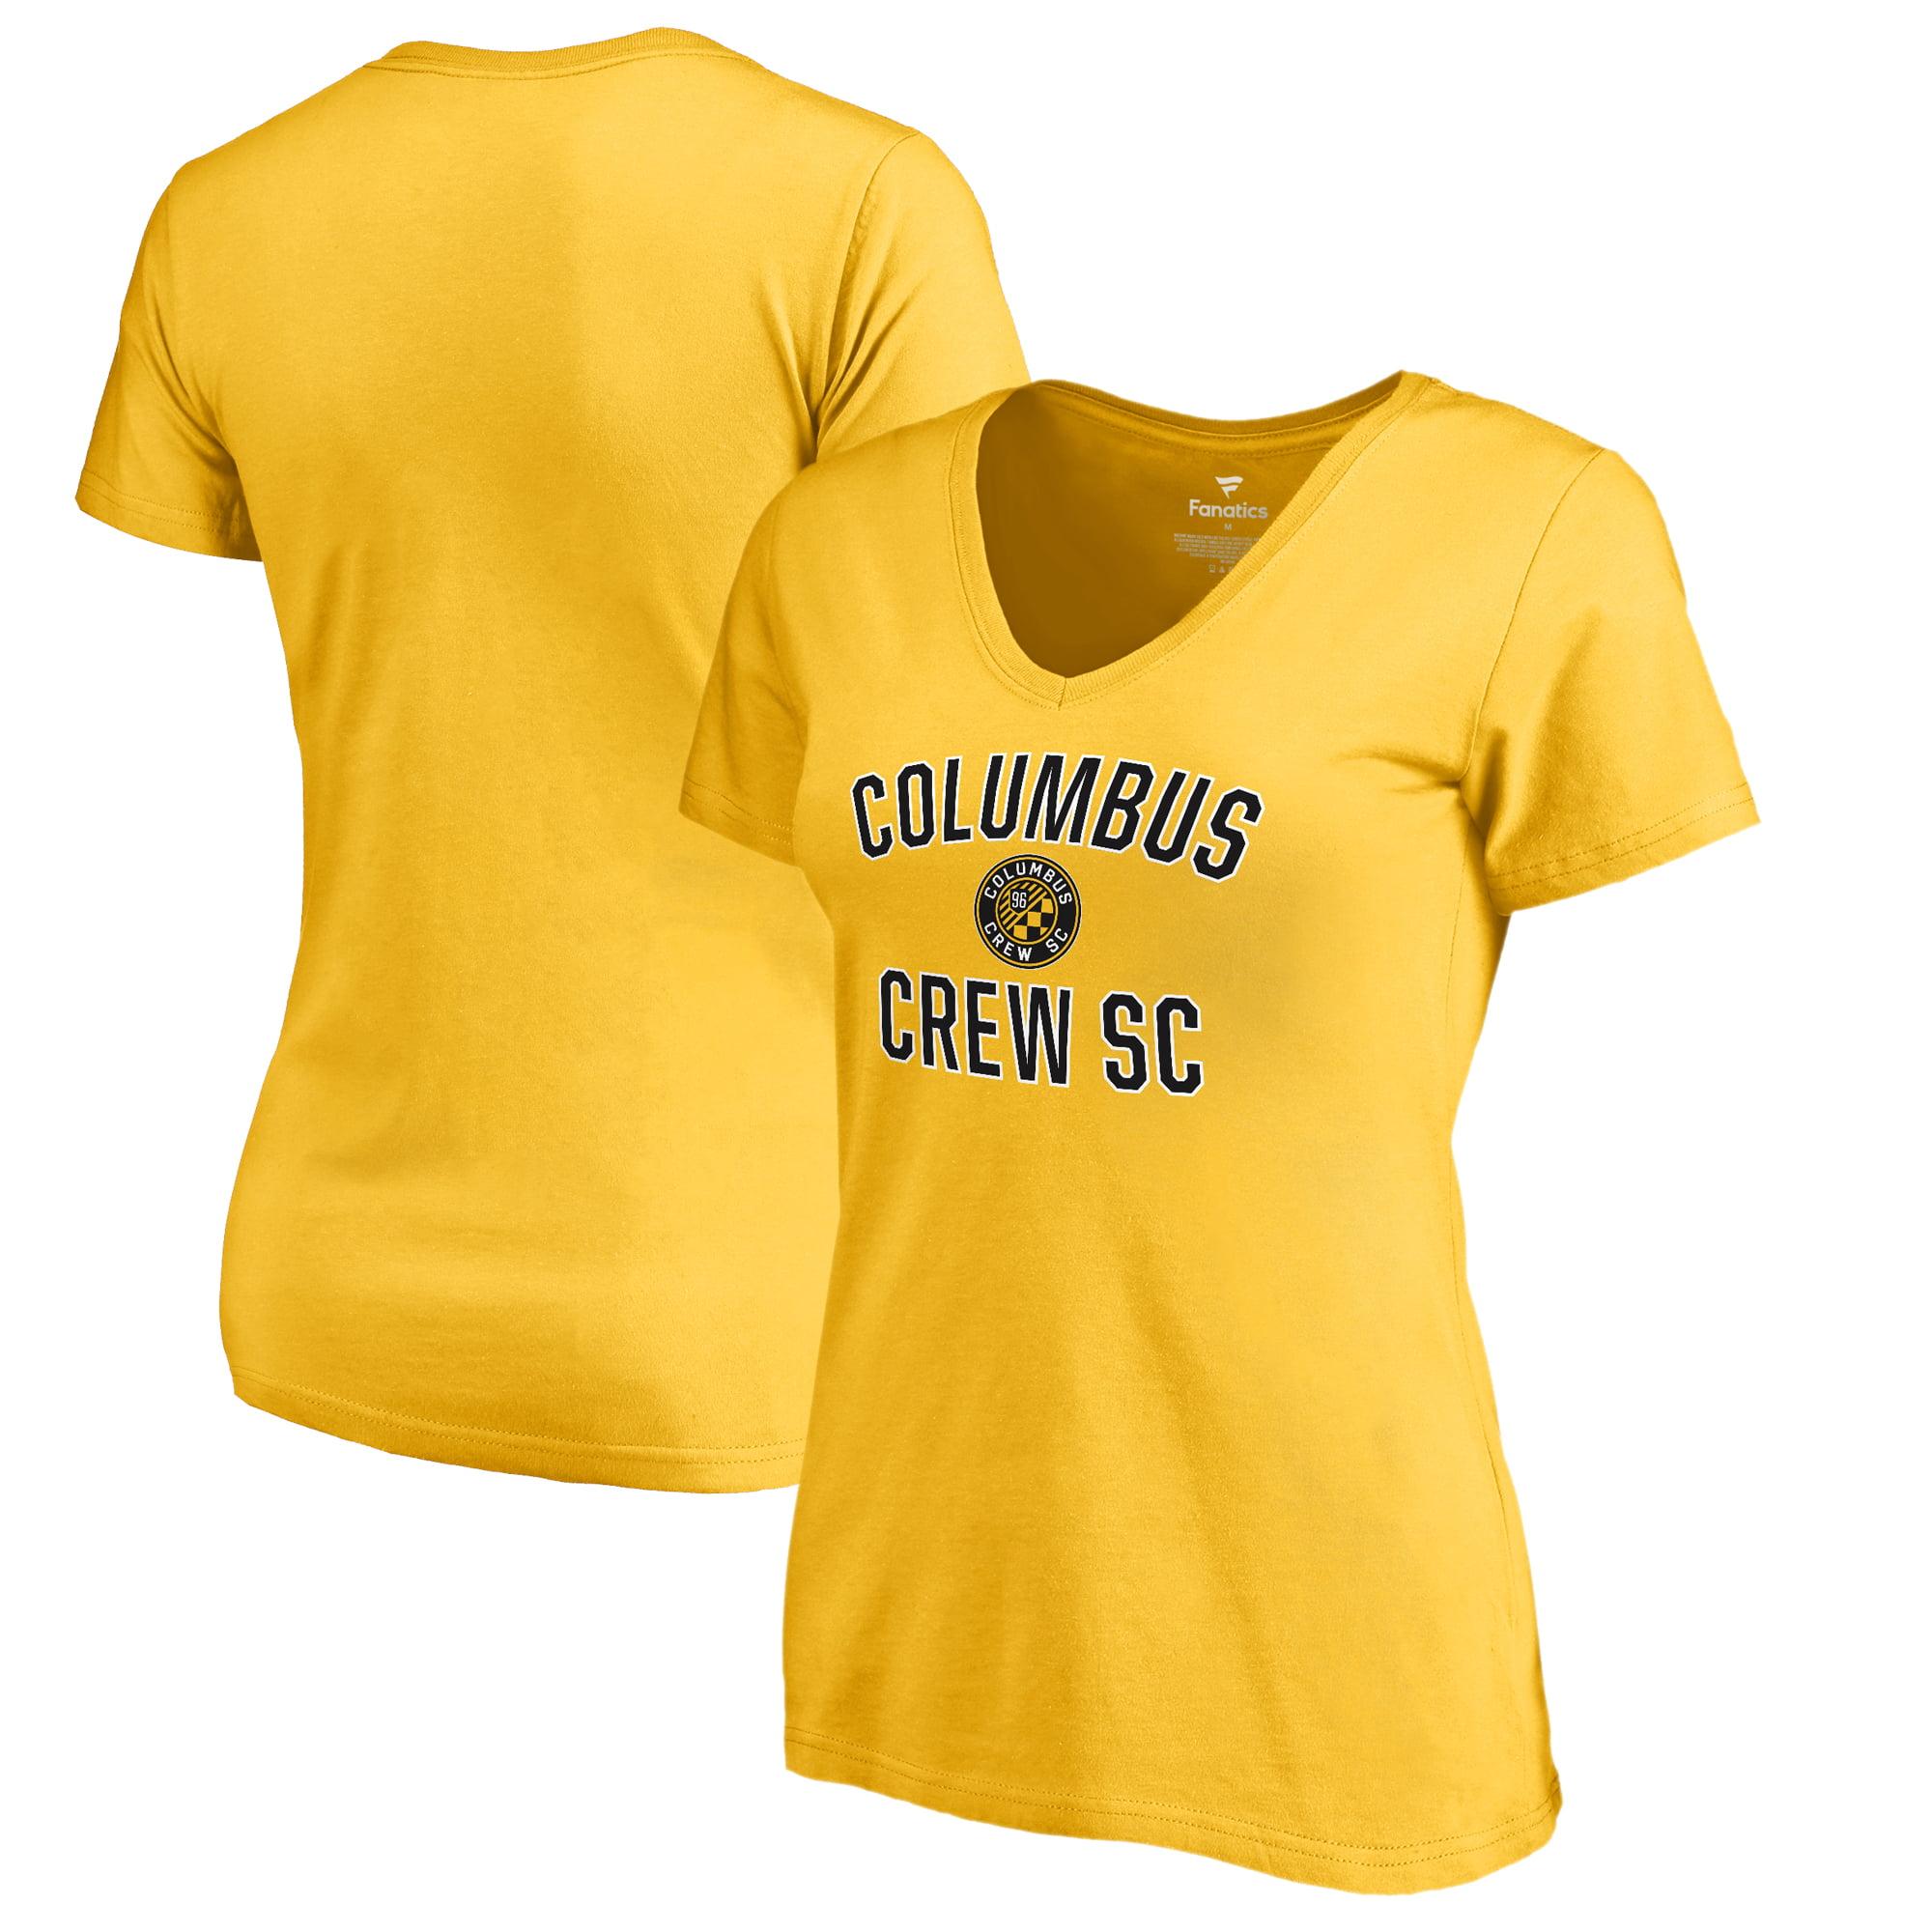 Columbus Crew SC Fanatics Branded Women's Victory Arch V-Neck T-Shirt - Yellow